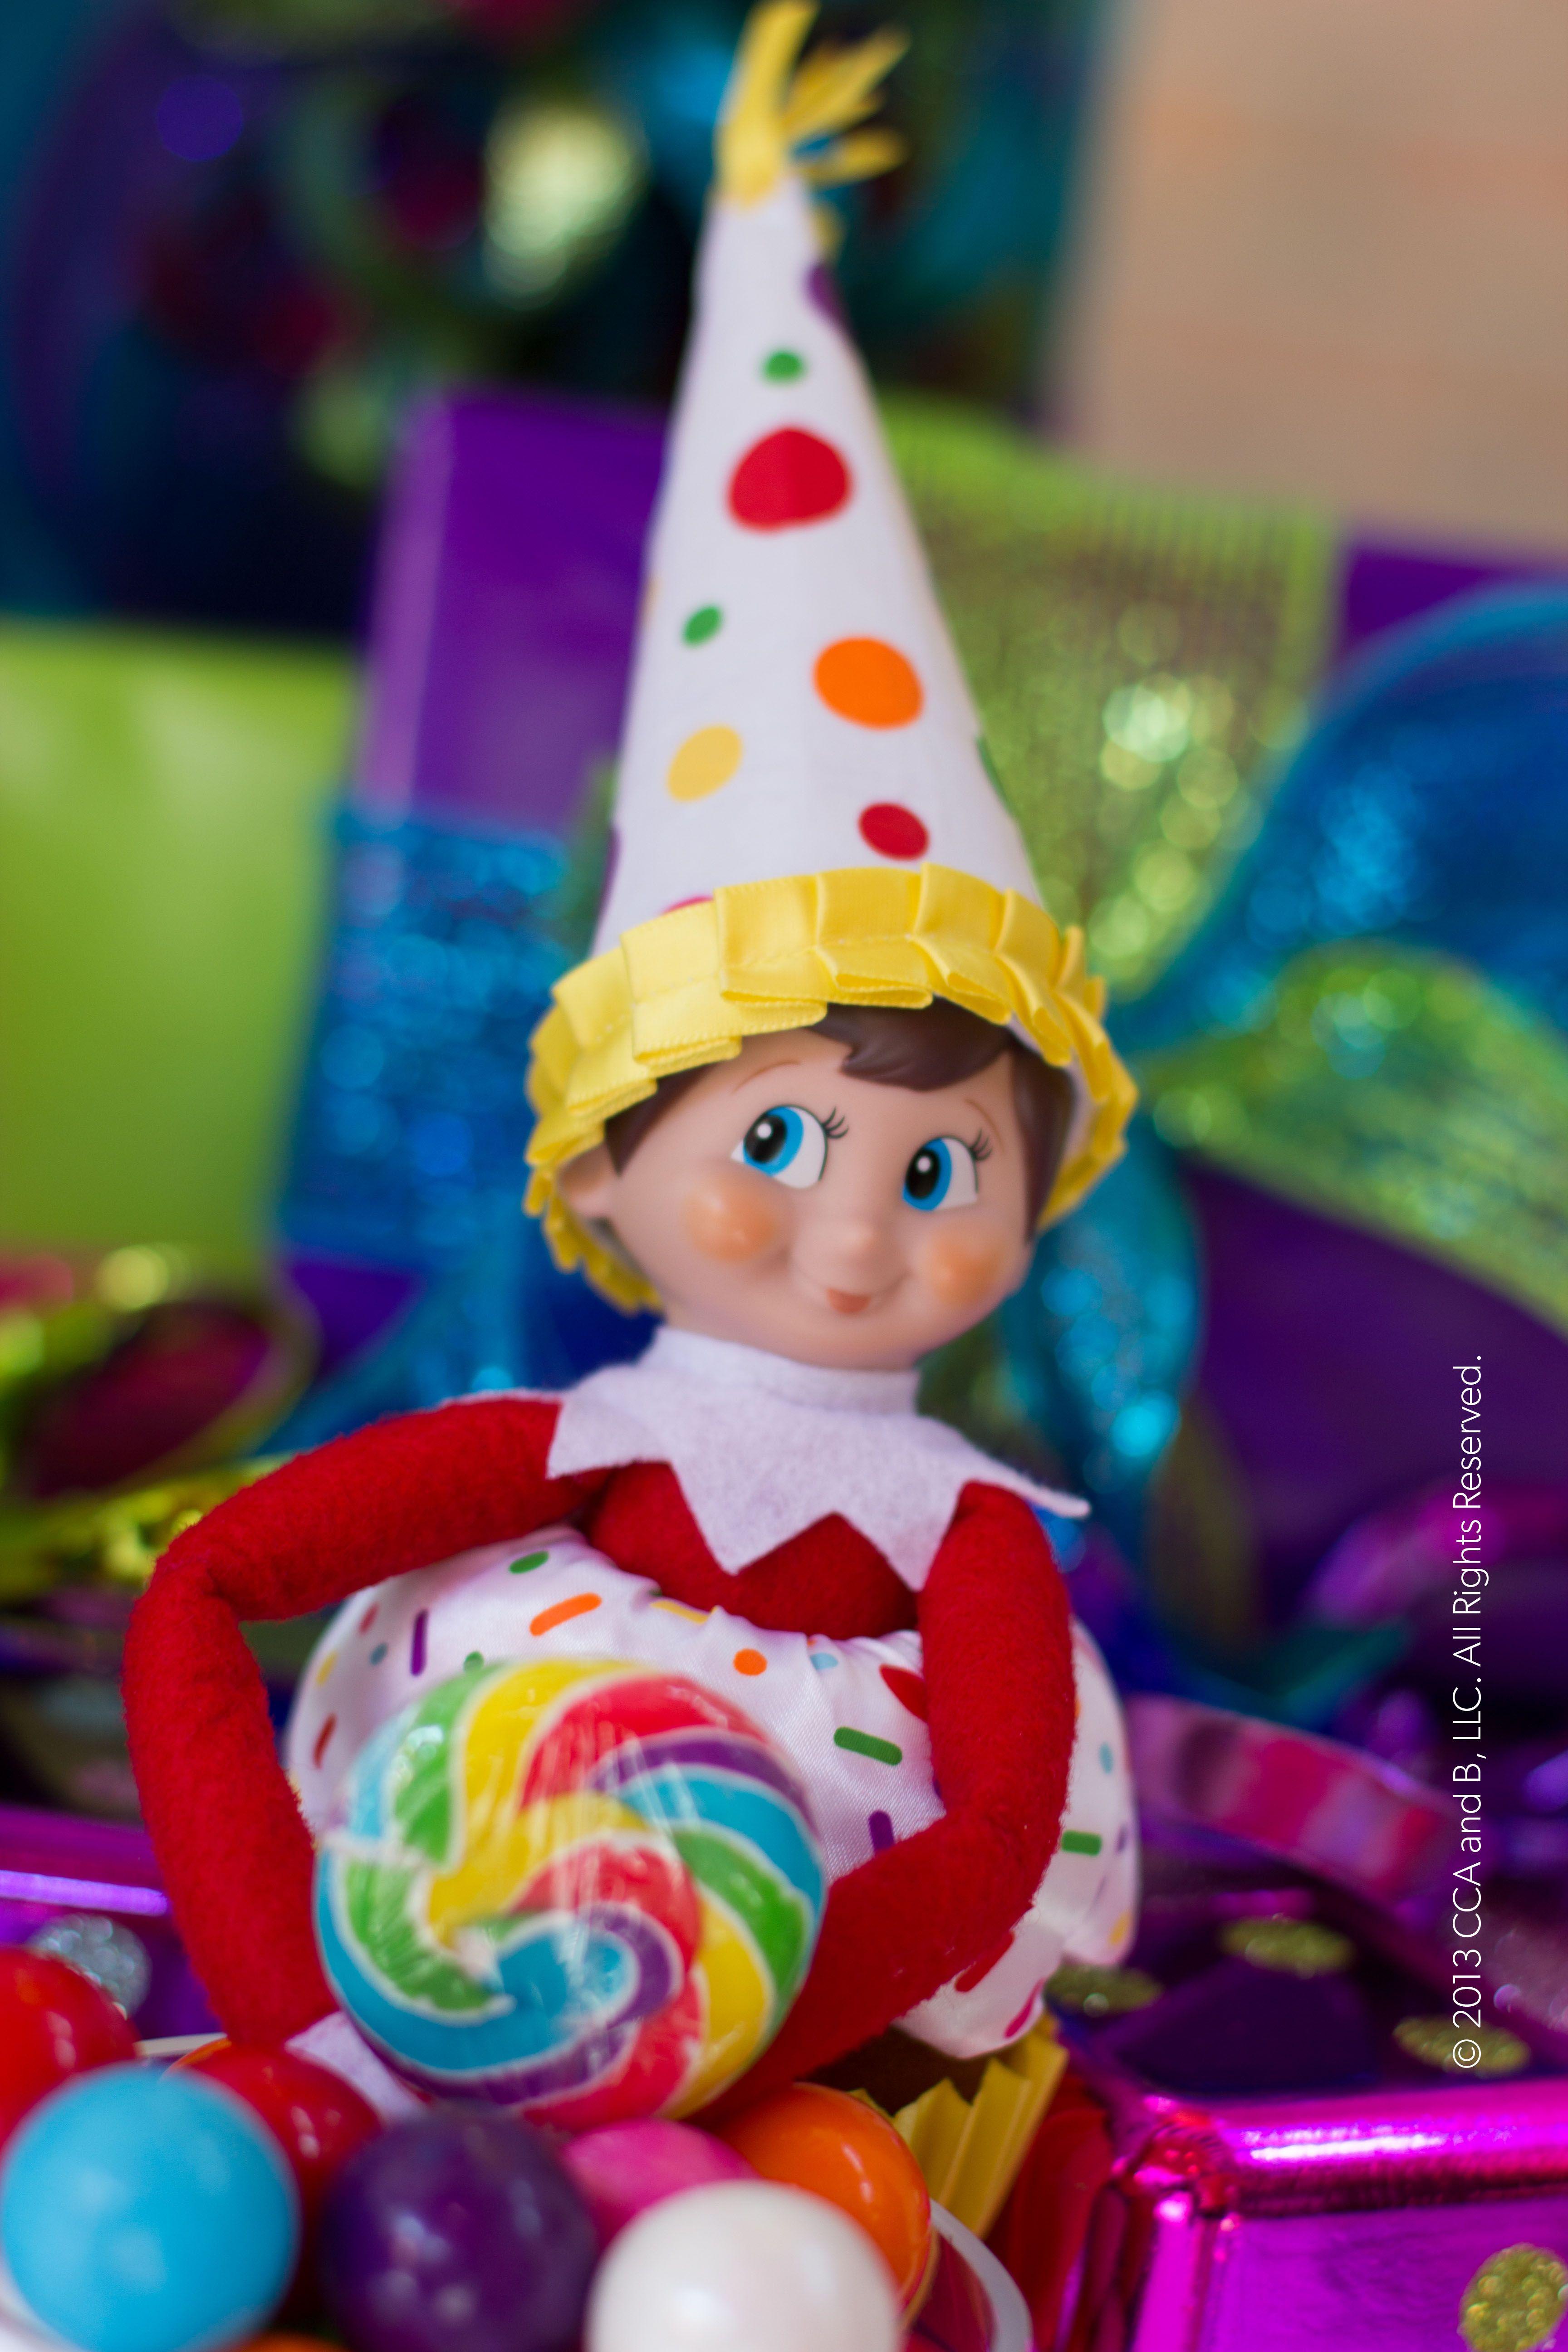 The sweetest elf (With images) Birthday elf, Elf fun, Elf